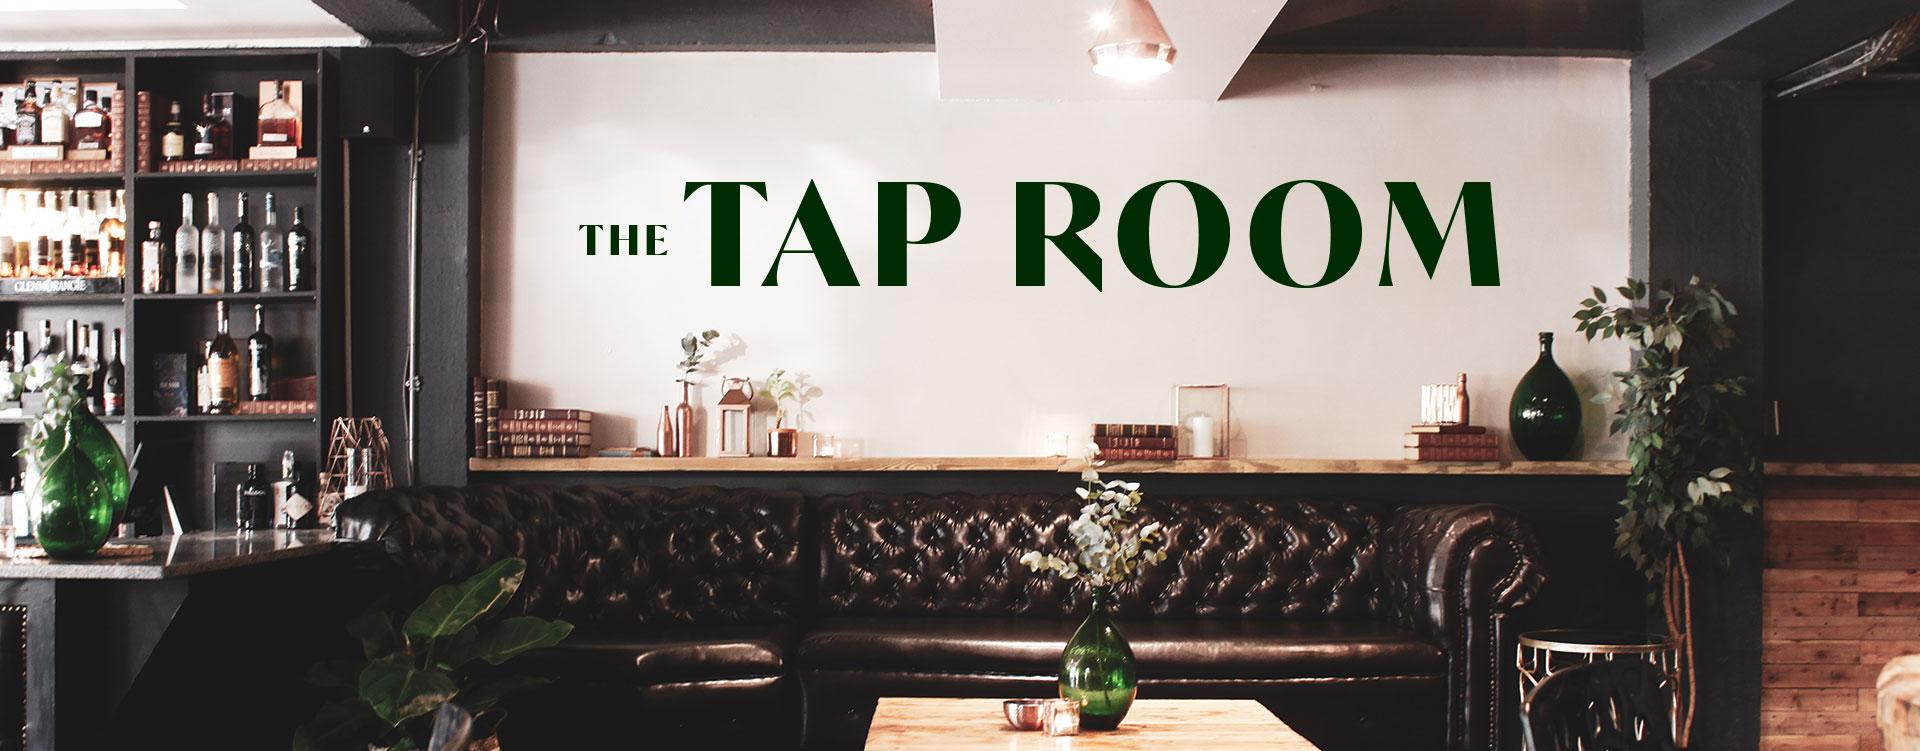 Bridge Street Brewery Tap Room Venue Hire